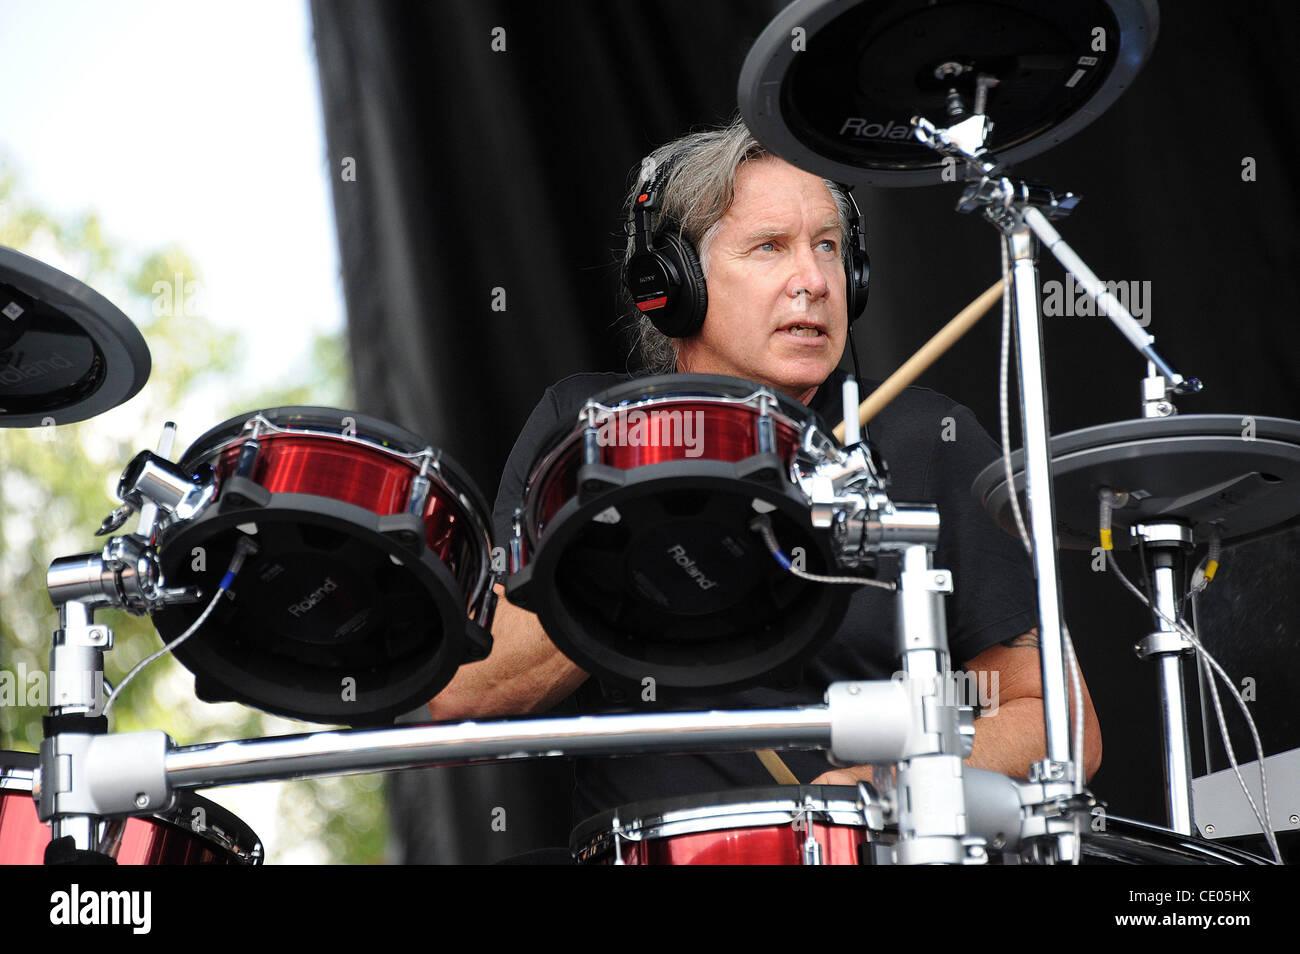 Aug 7 2011 Chicago Illinois USA Drummer DAVID ROBINSON of